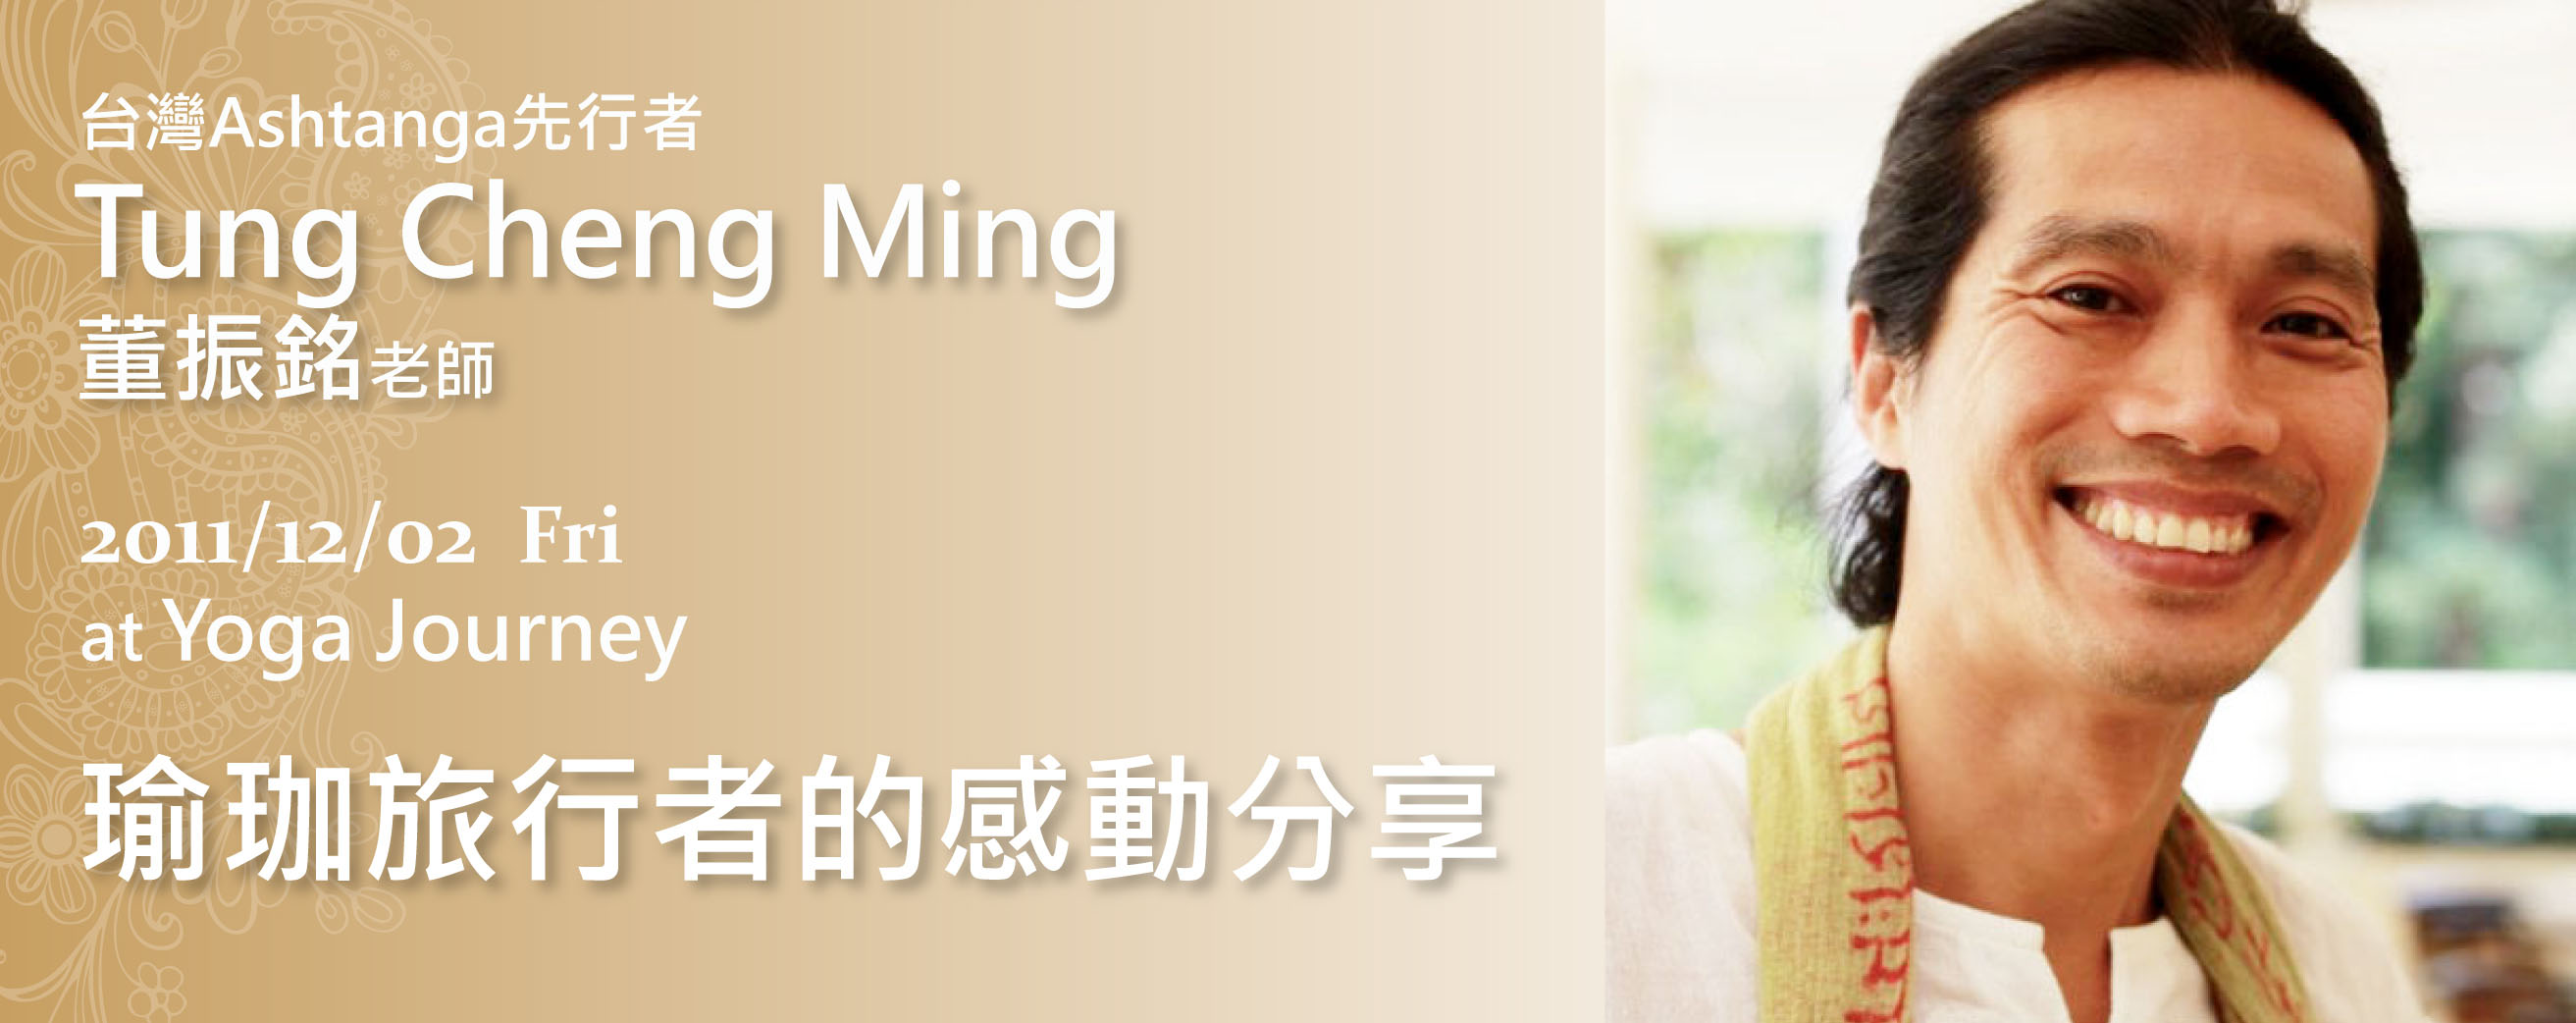 Yoga Journey瑜珈旅程 Tung Cheng Ming